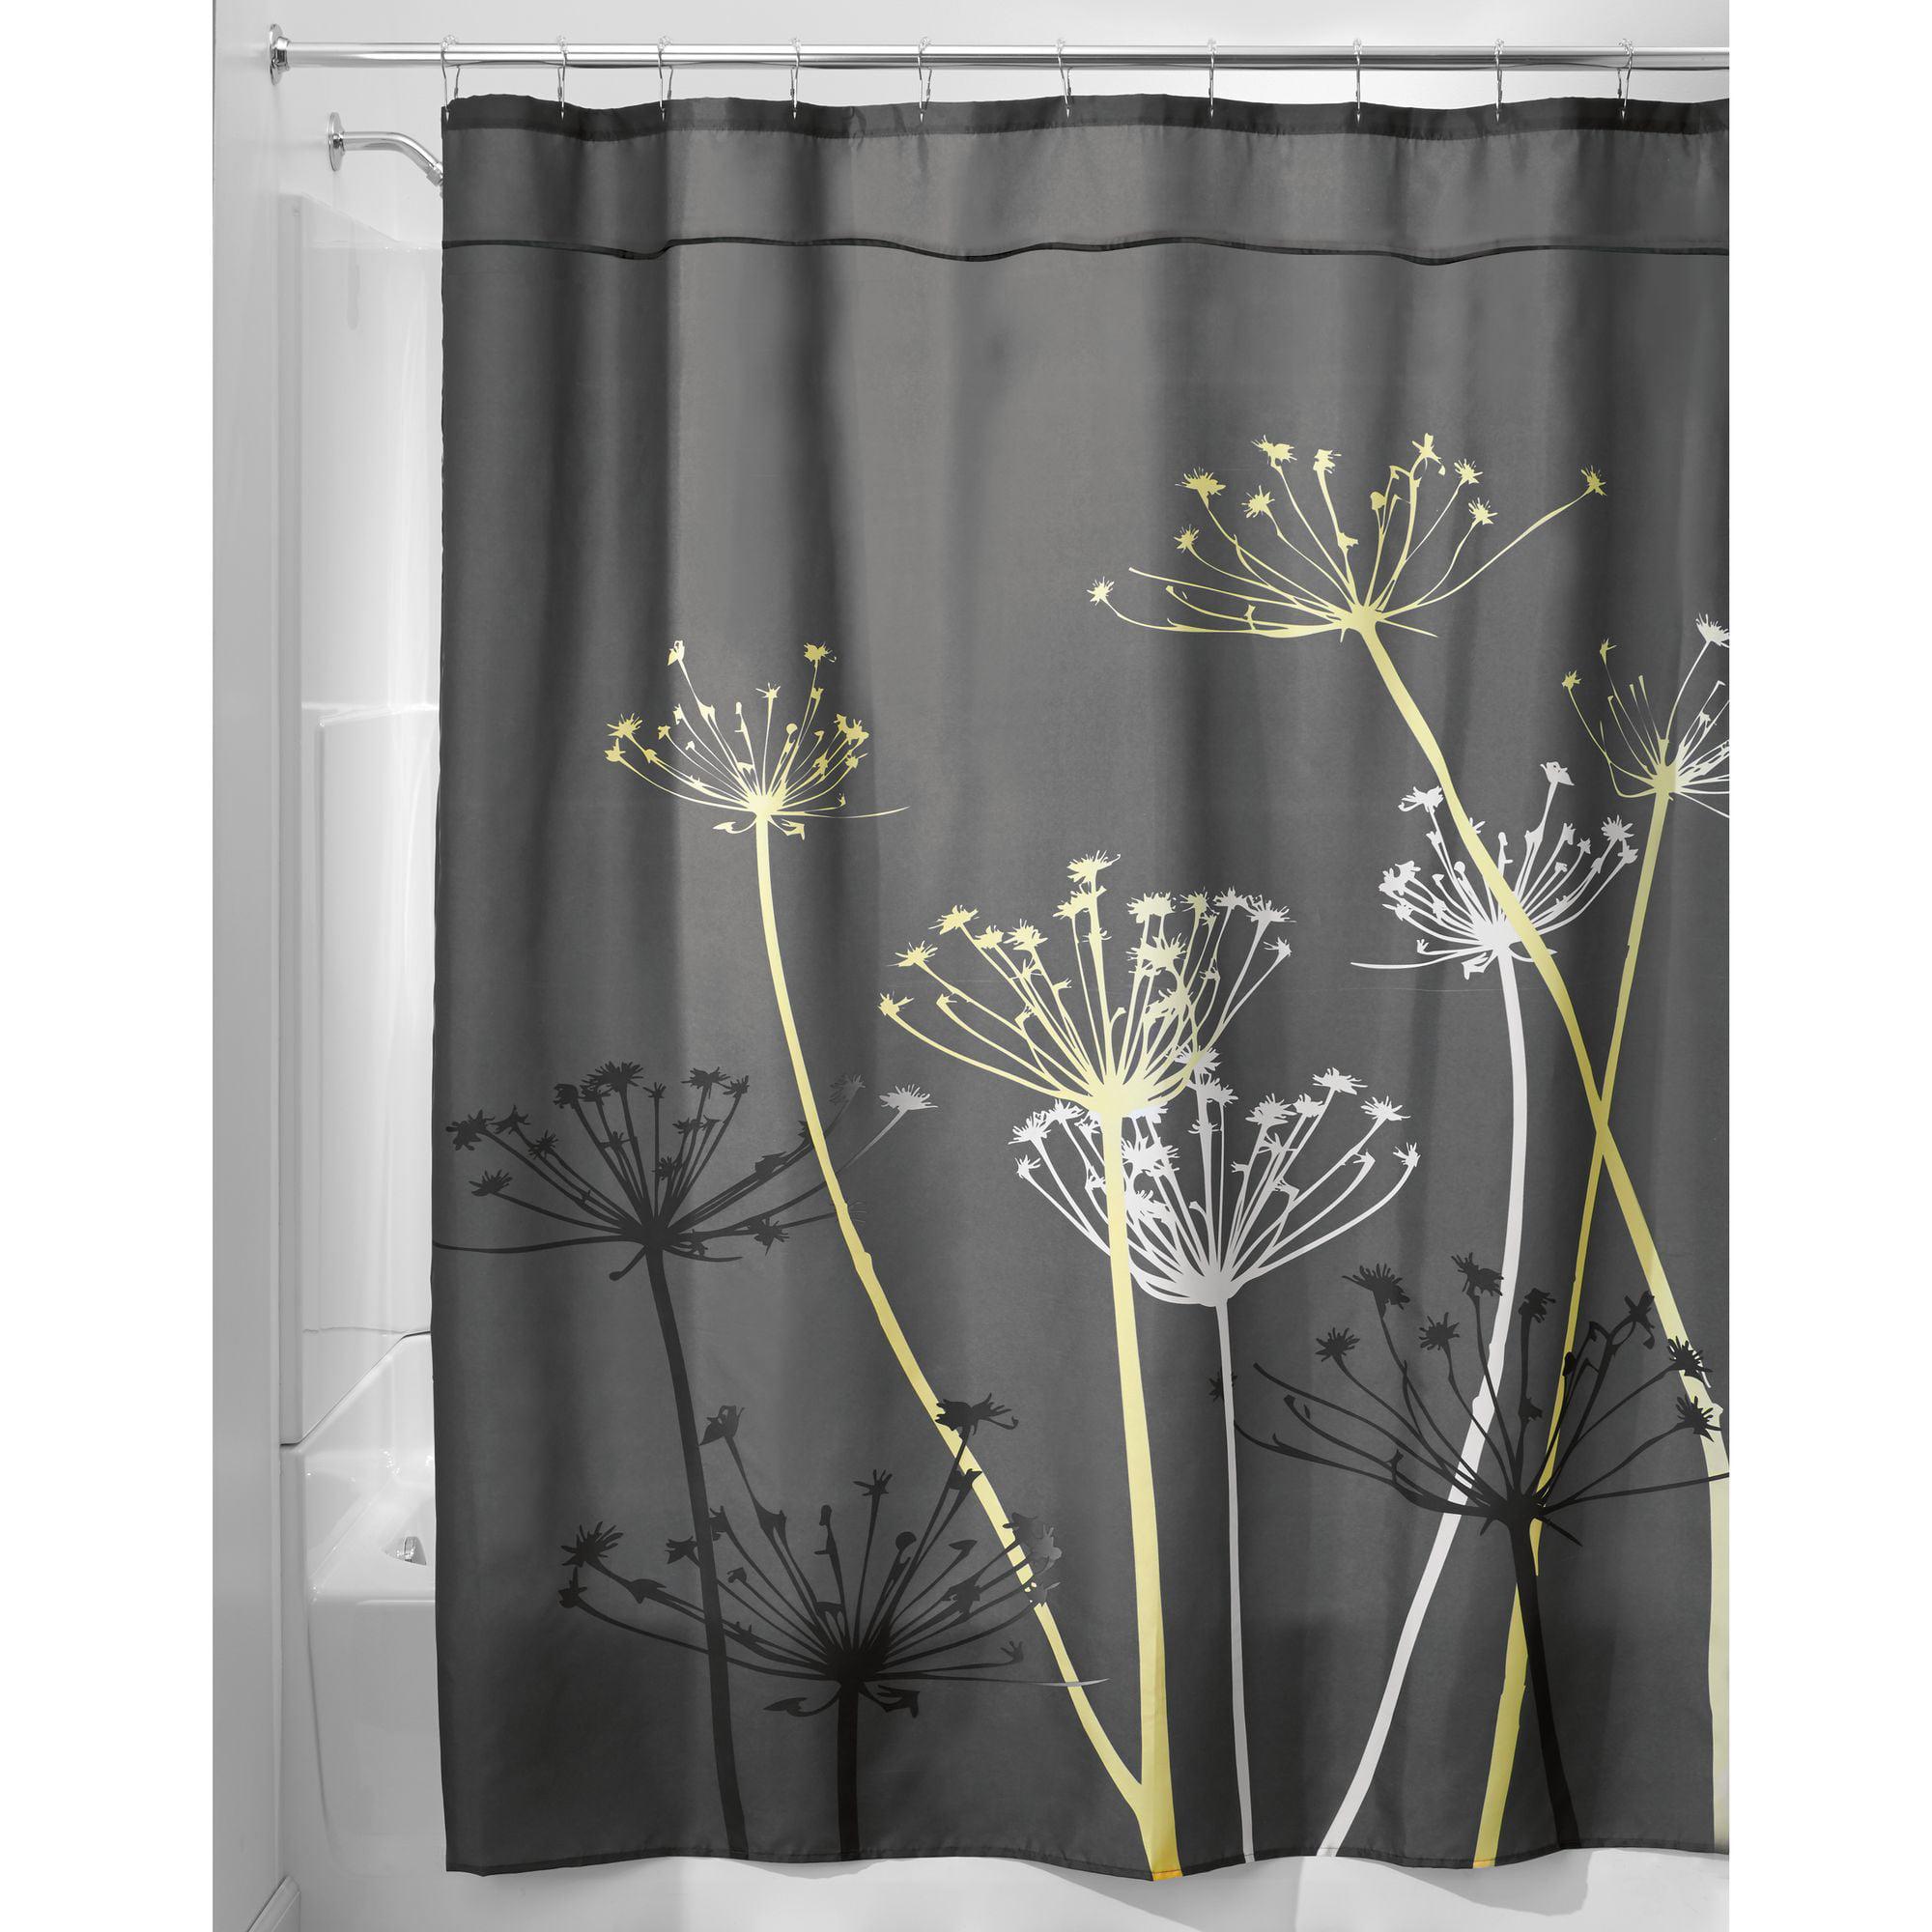 "InterDesign Thistle Fabric Shower Curtain, Standard 72"" x 72"", Gray/Yellow"